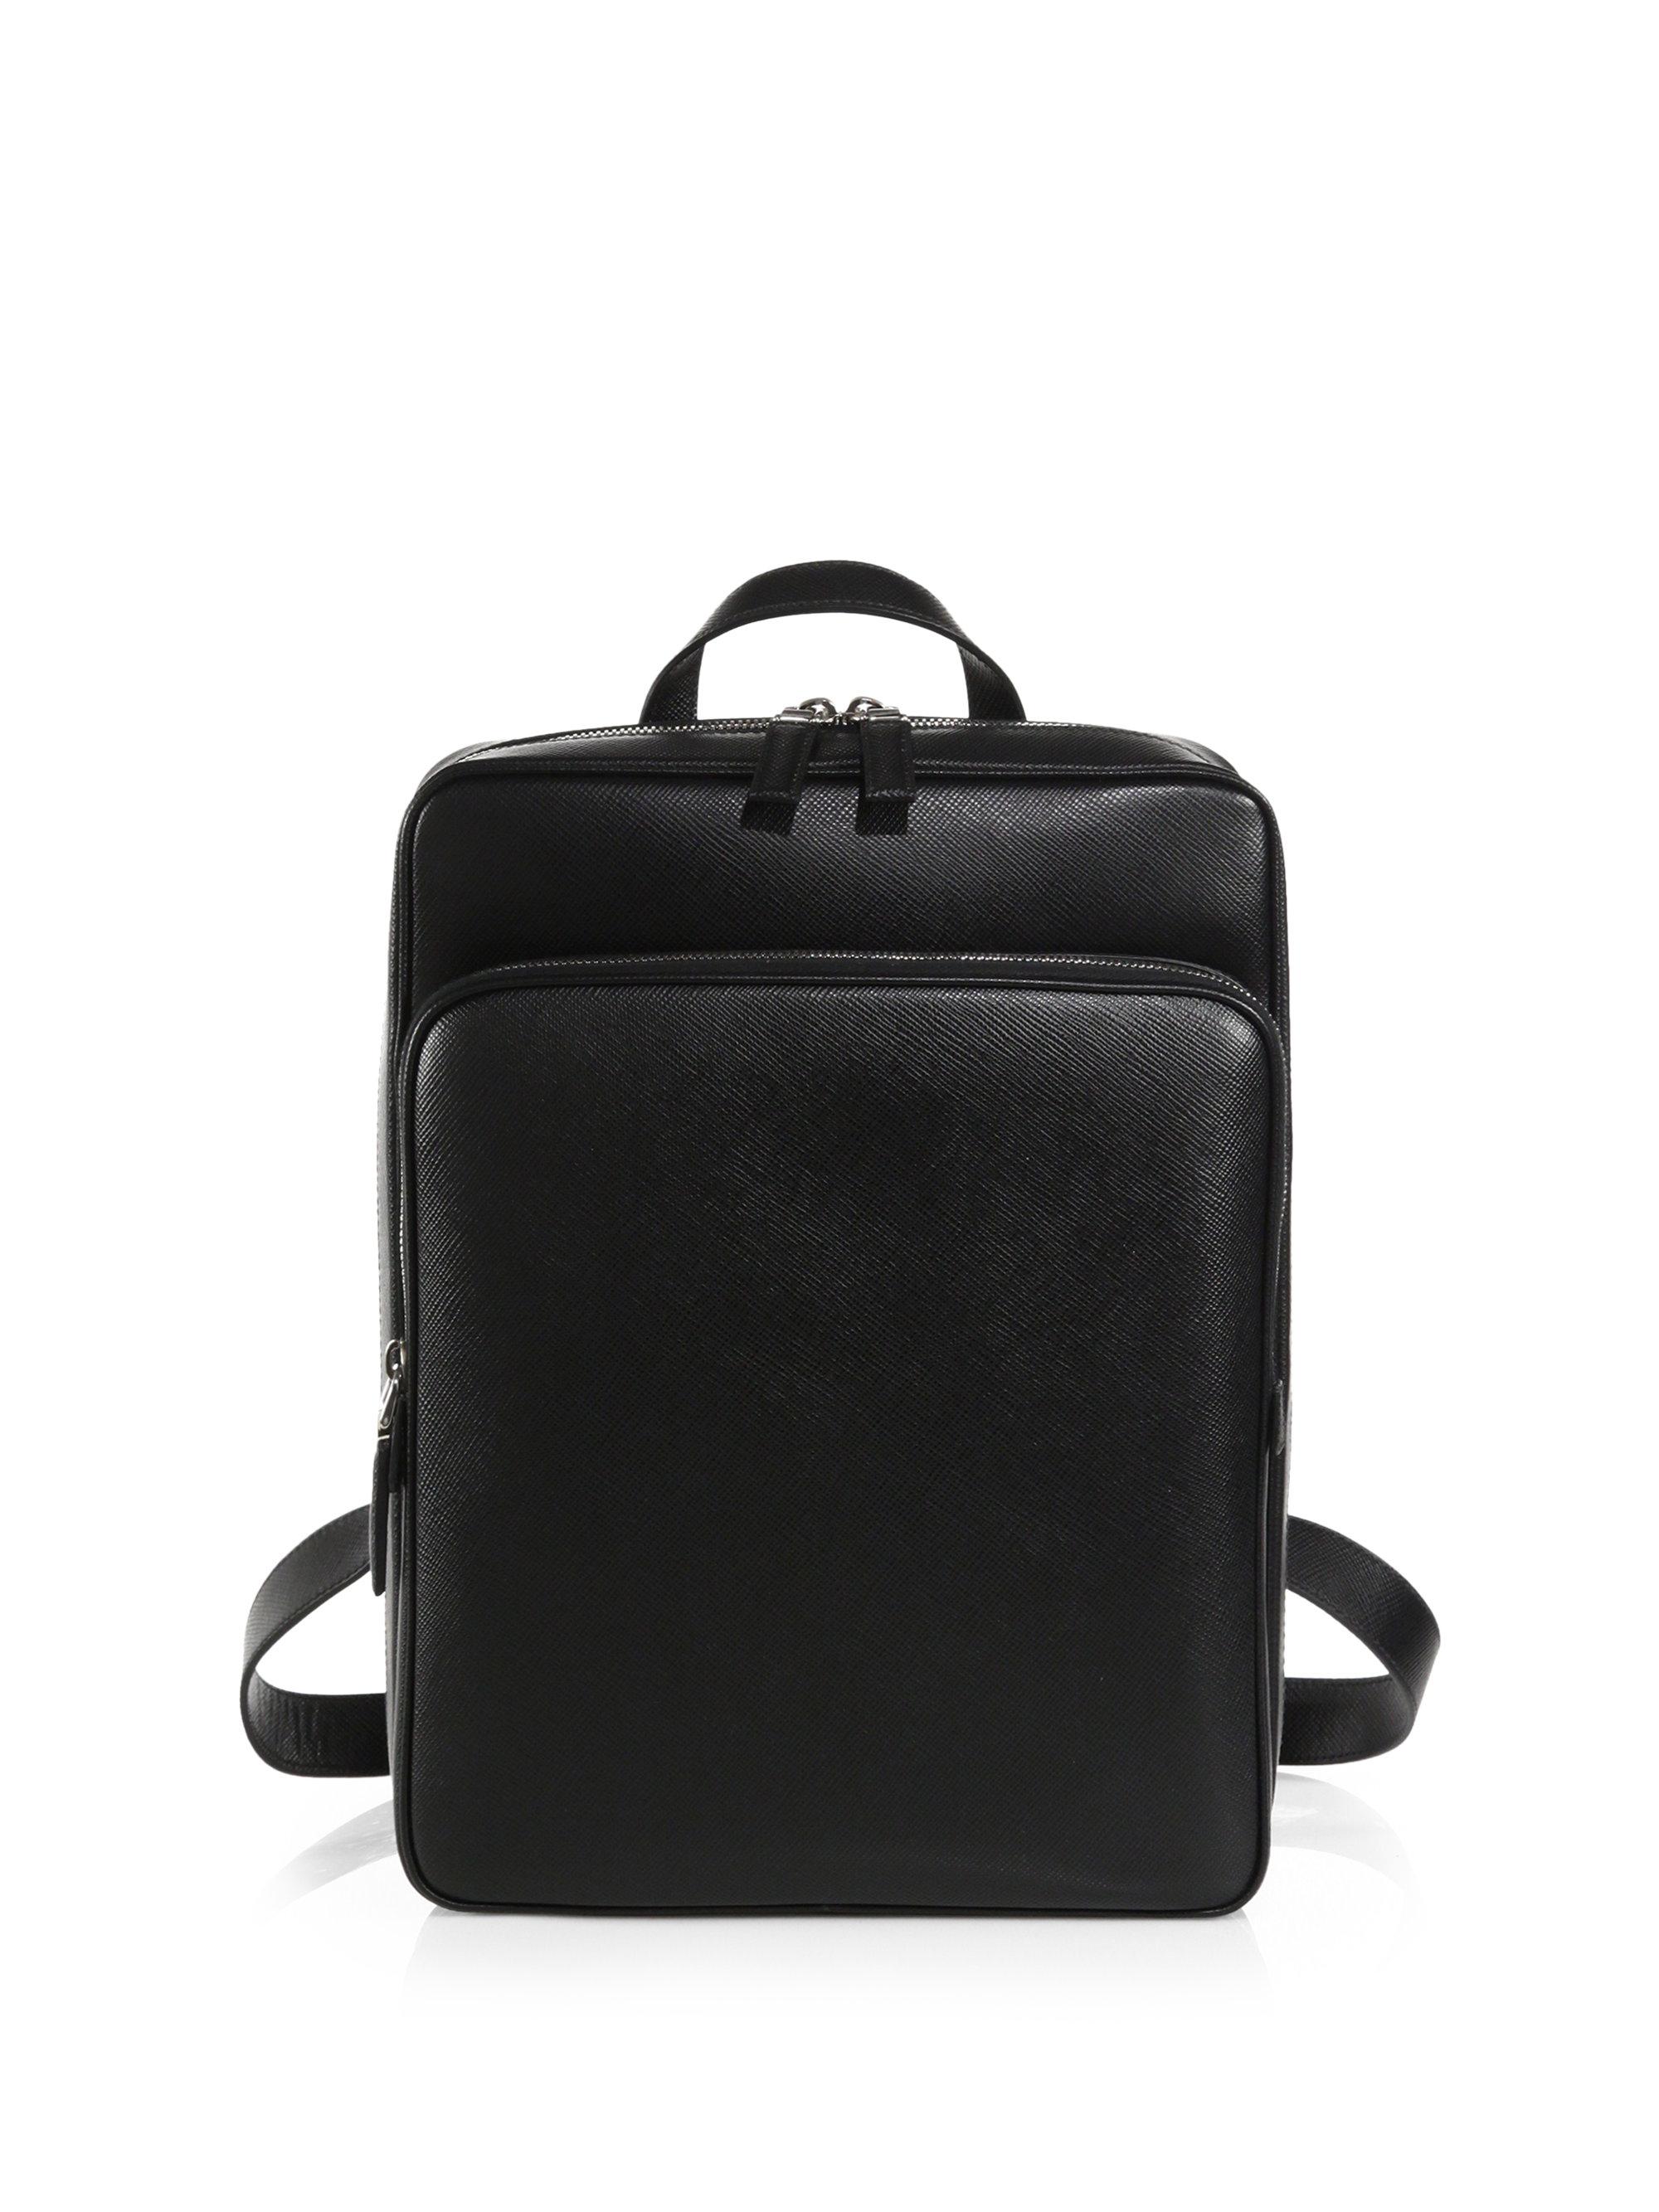 Prada Saffiano Cuir Backpack in Black for Men | Lyst